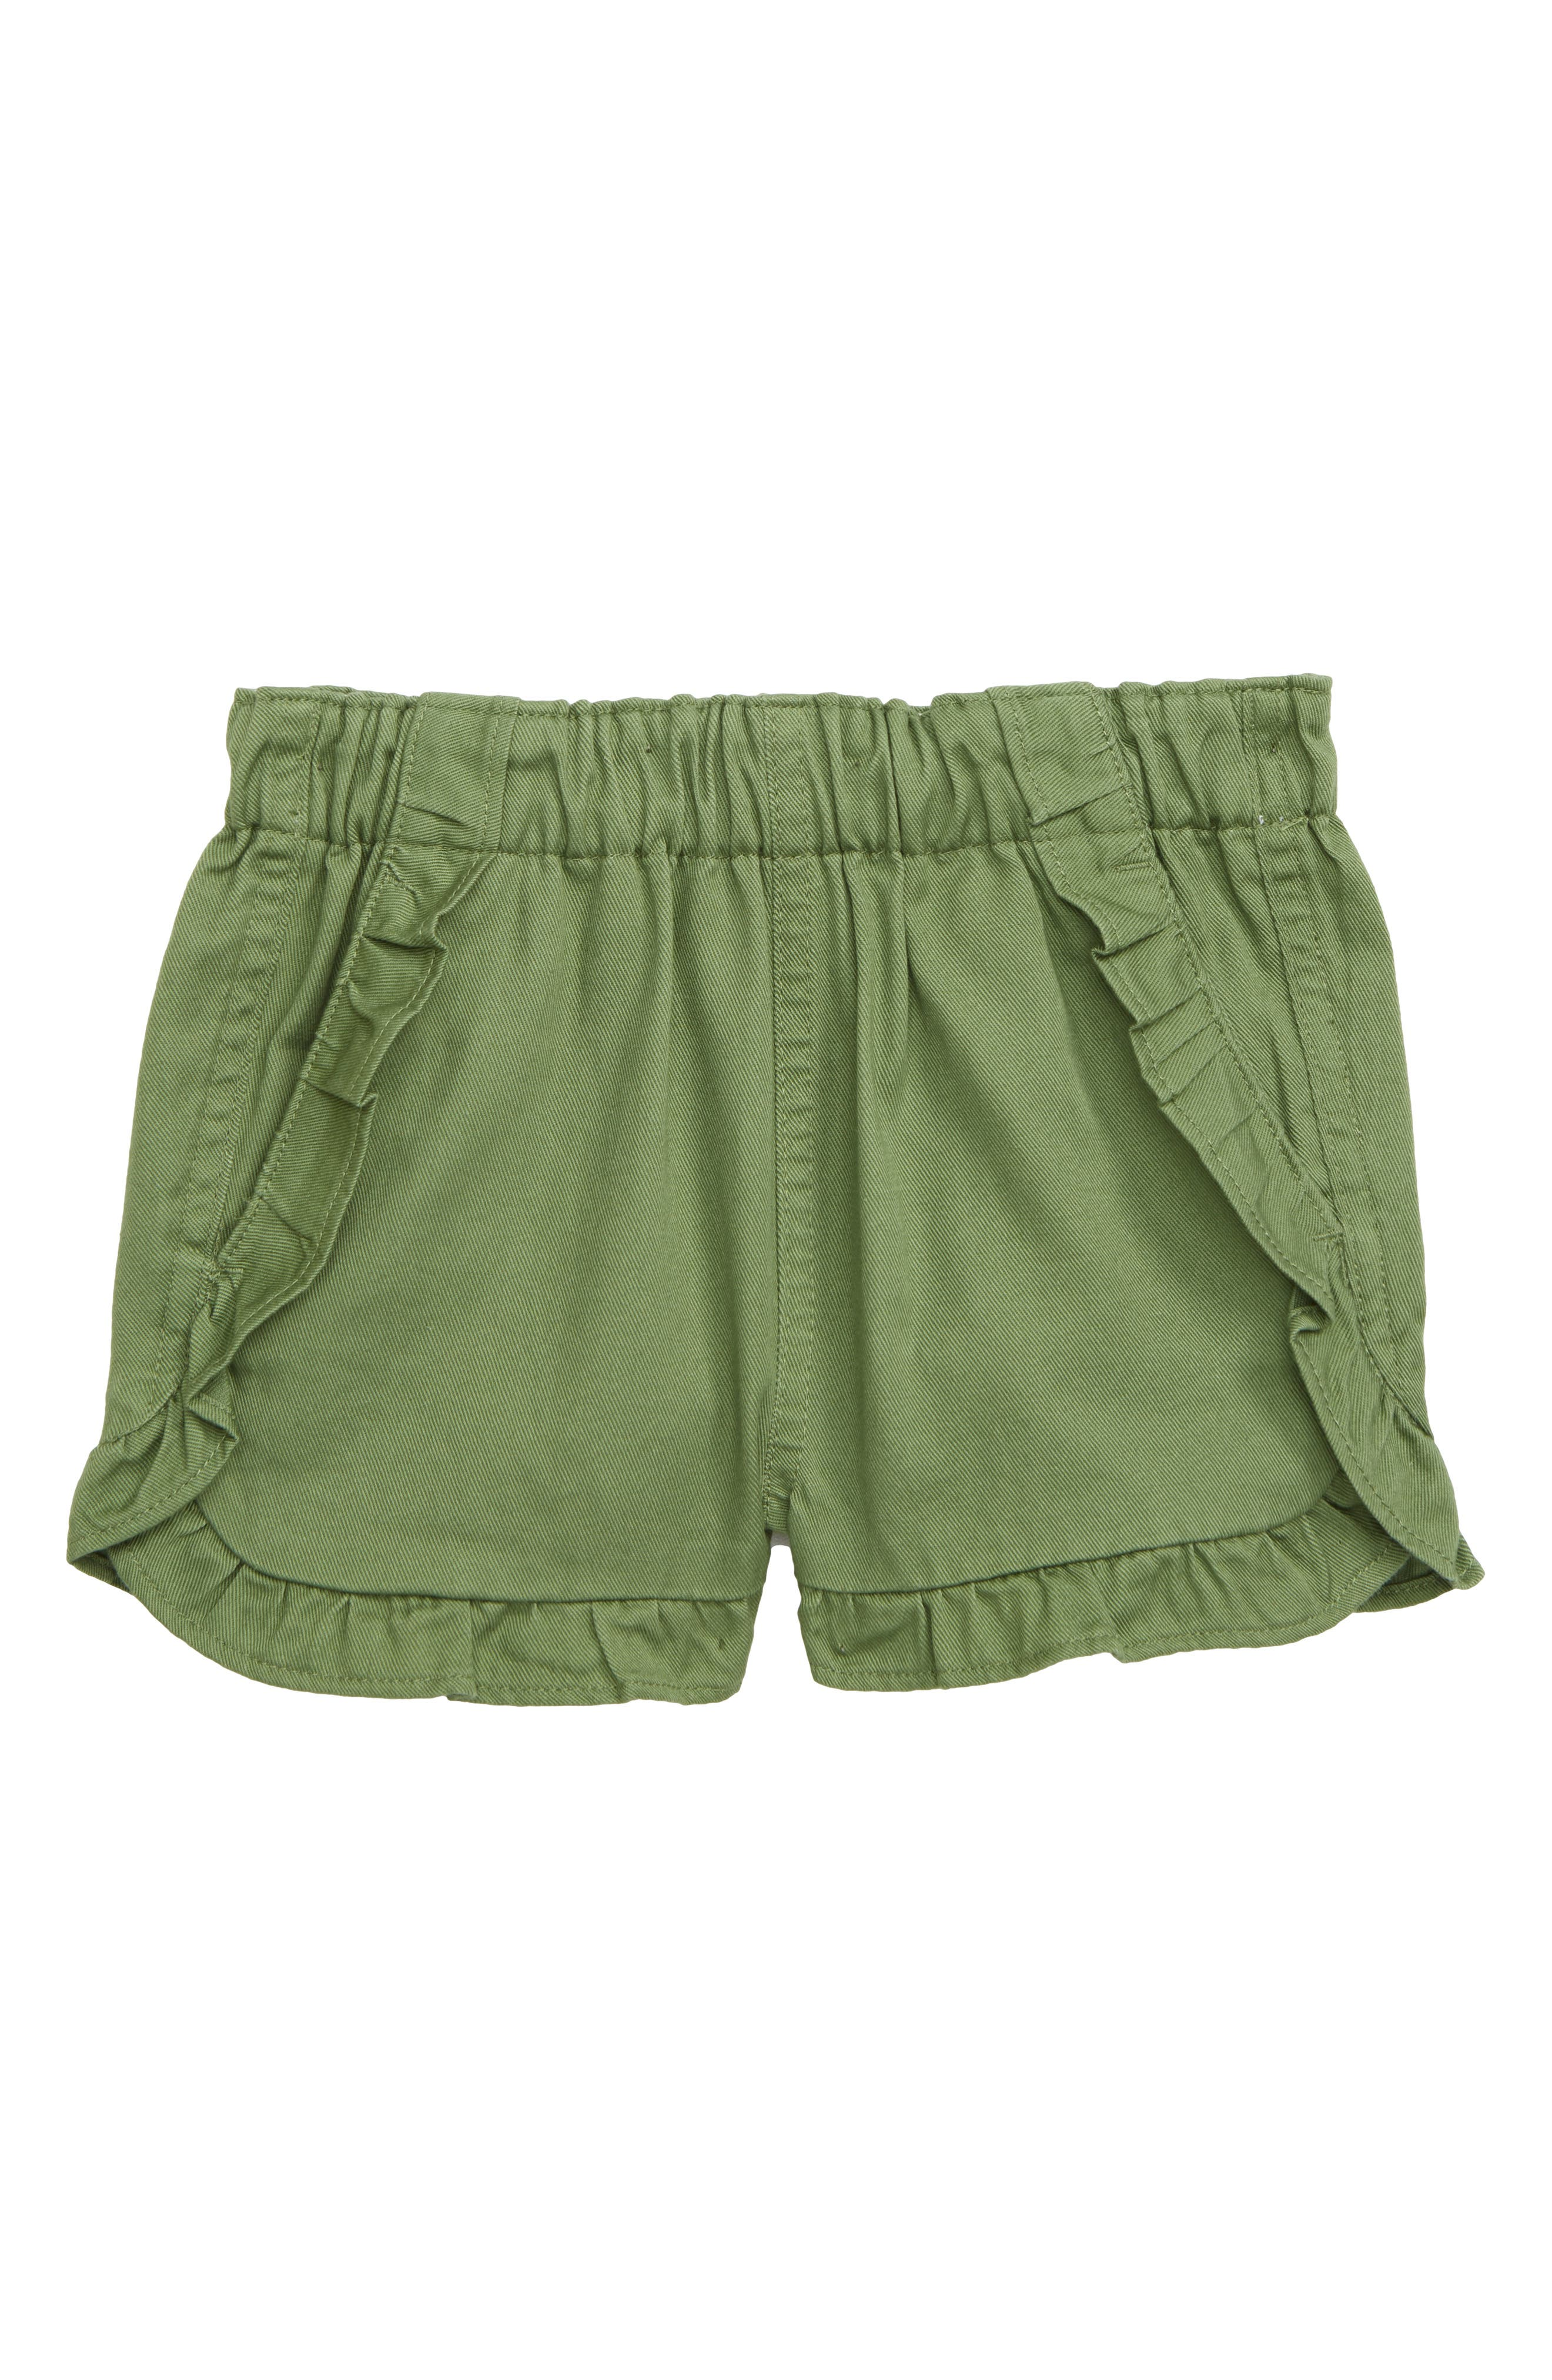 Girls Crewcuts By Jcrew Elsa Ruffle PullOn Shorts Size 5  Green